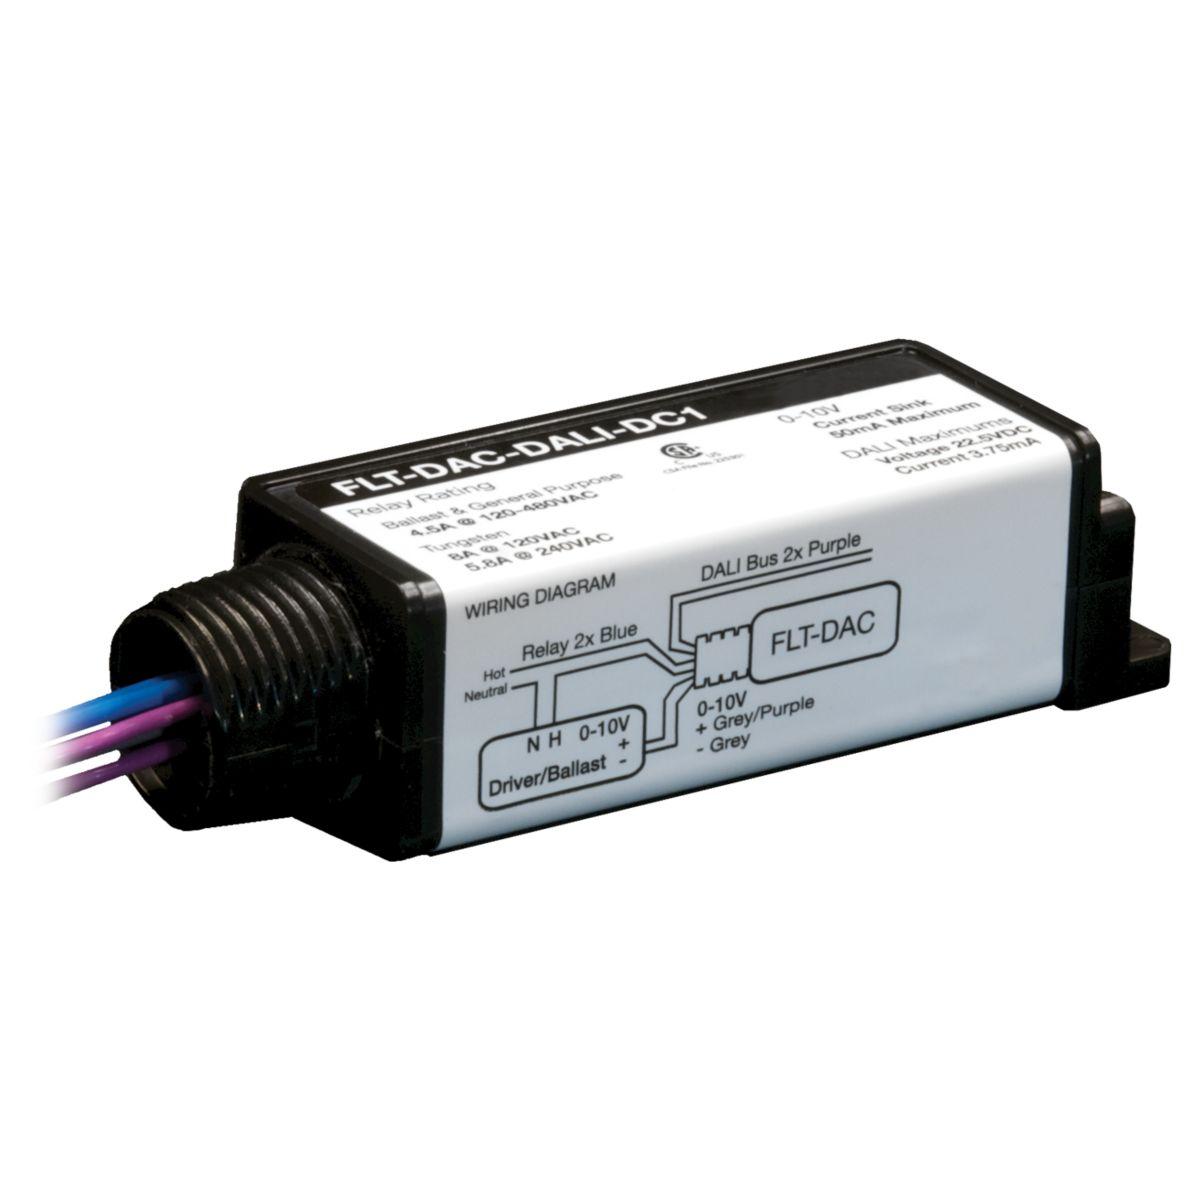 Fifth Light Digital to Analog Converter